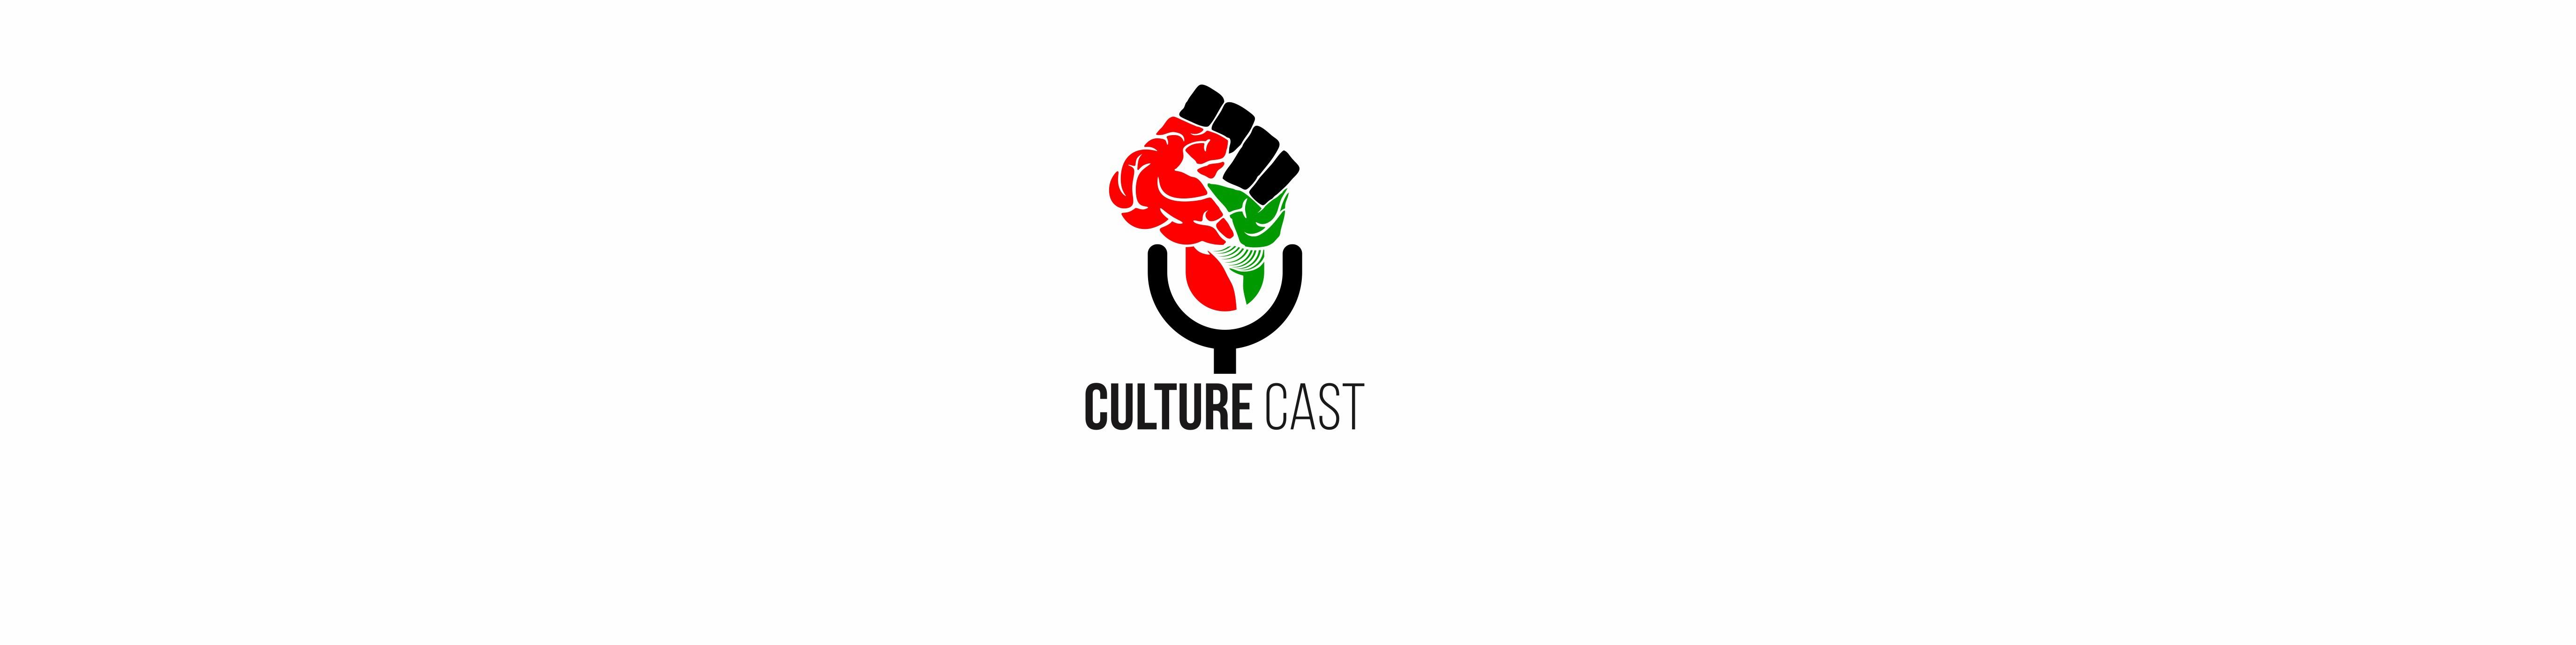 Logo and social media design for podcast distribution platform geared to Black people